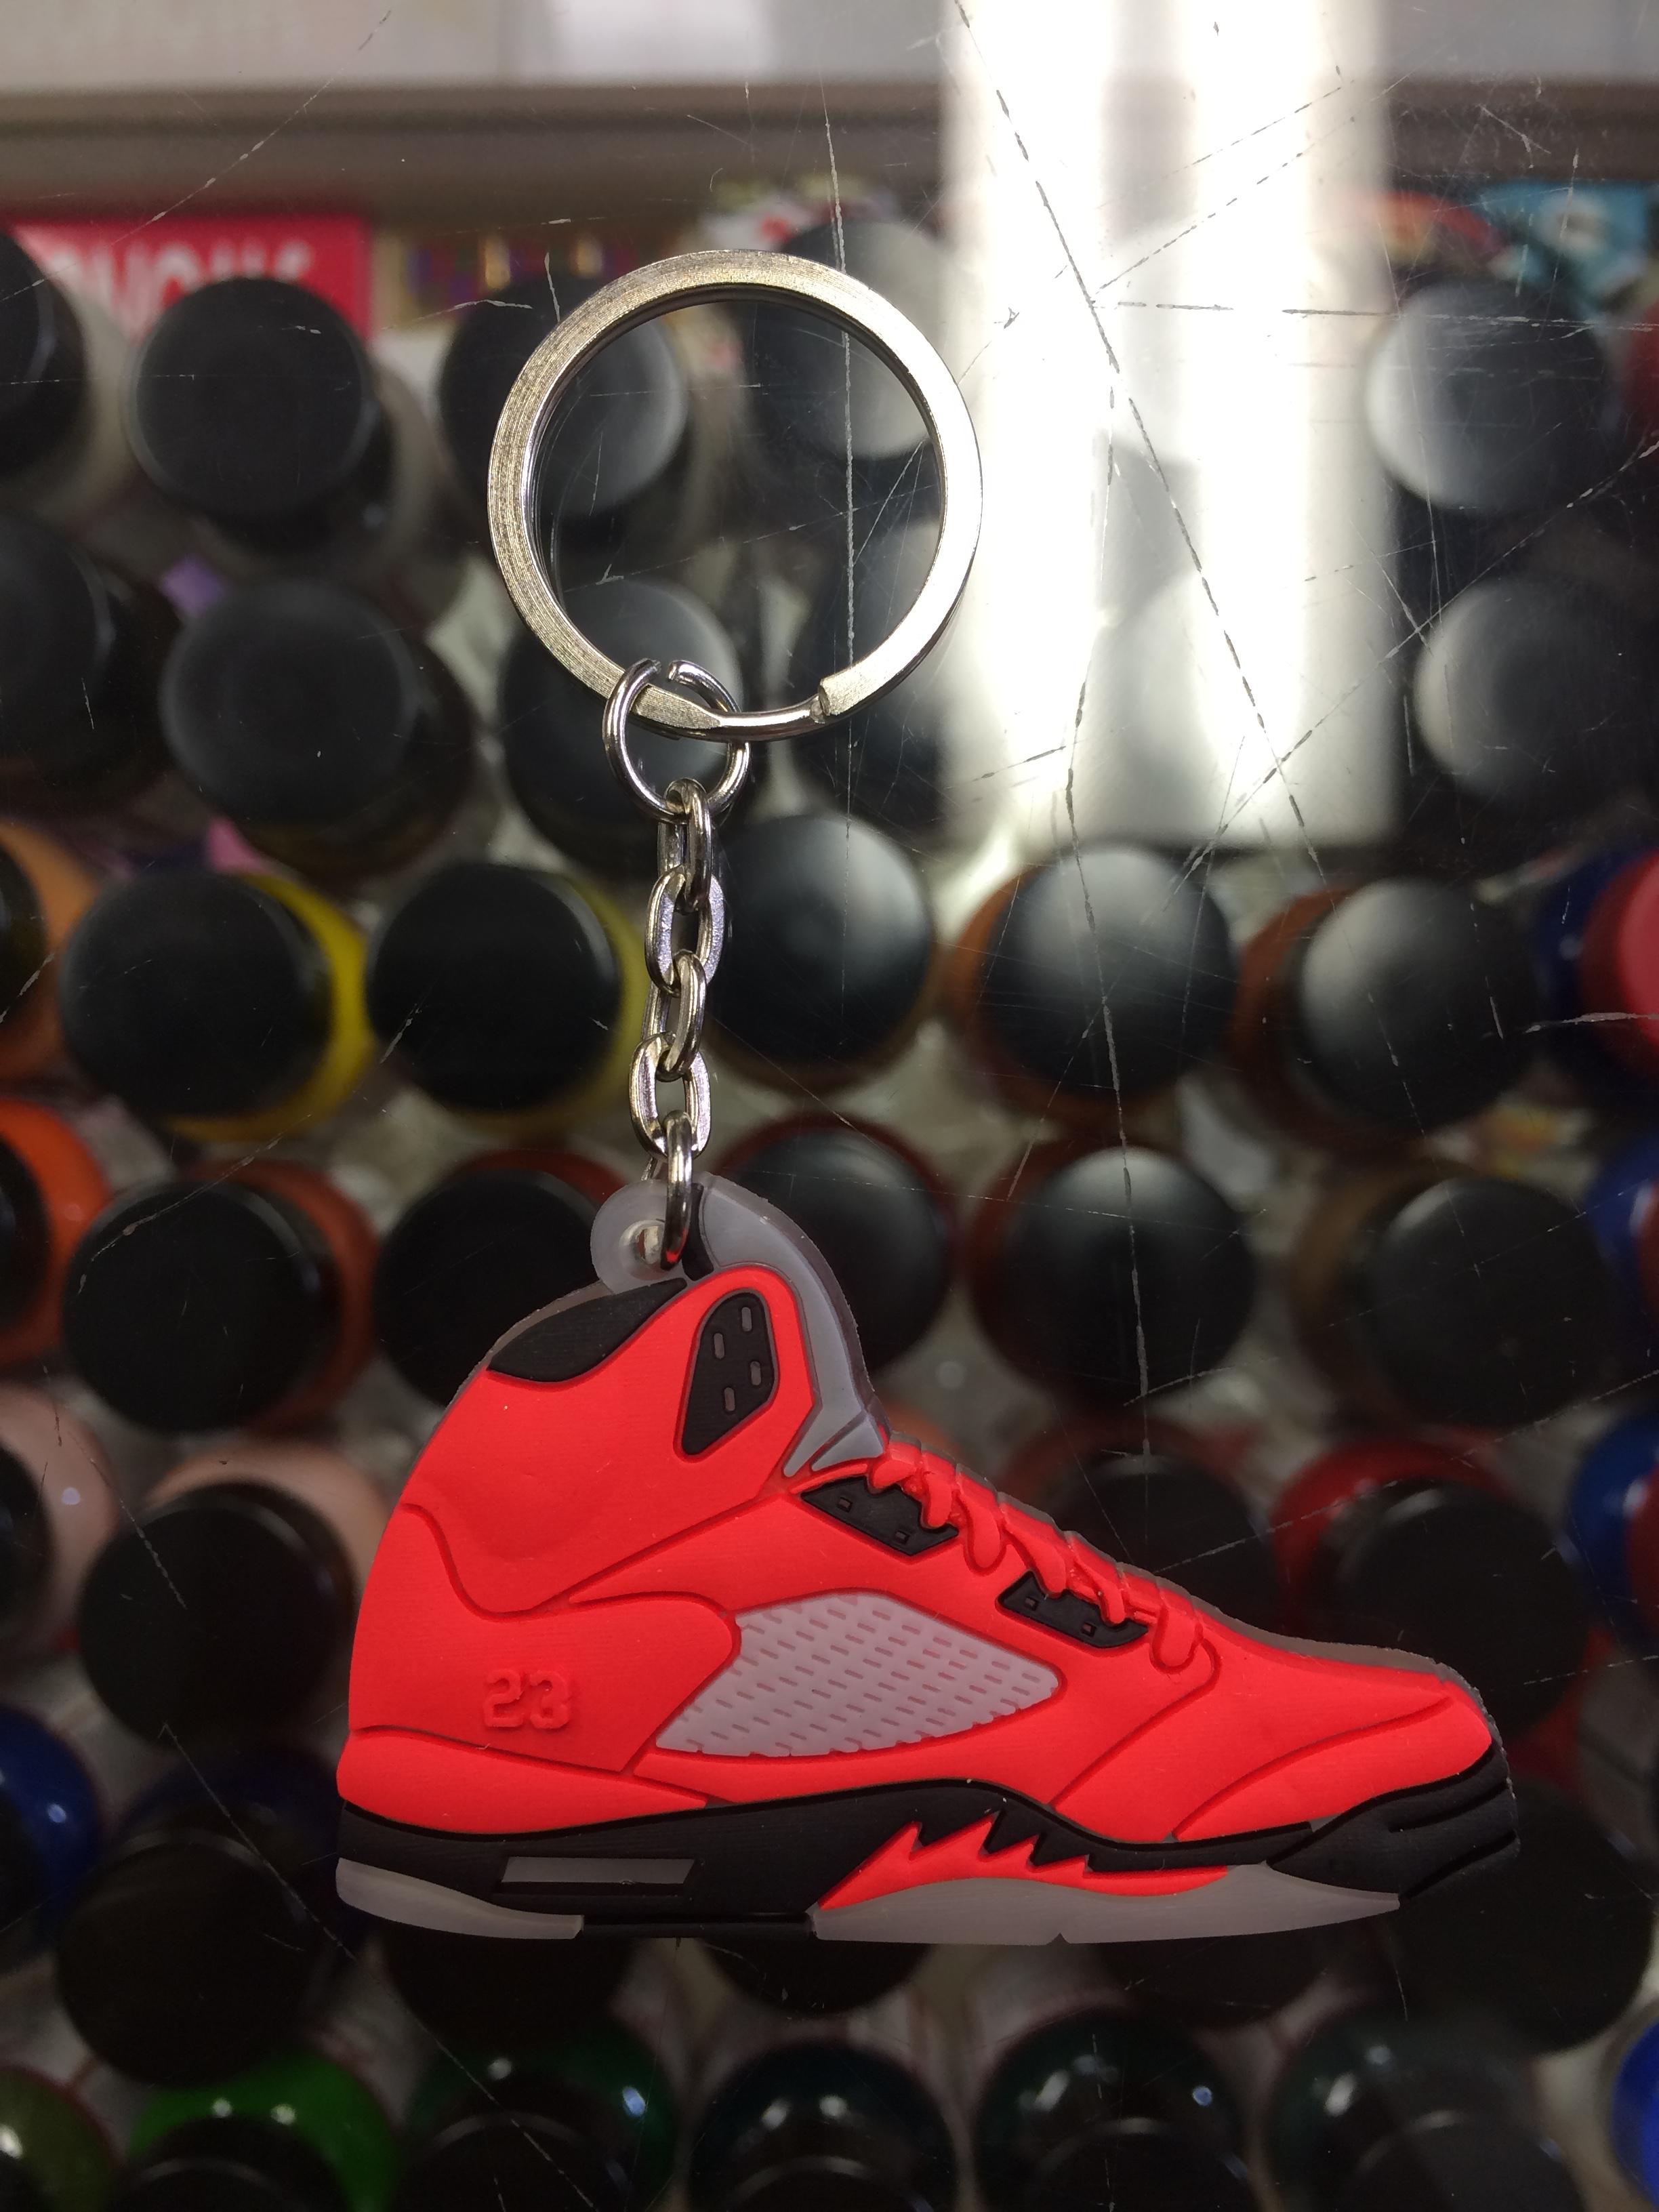 super popular 52b18 166ab 2009 Nike Air Jordan V Raging Bull 2D Keychain